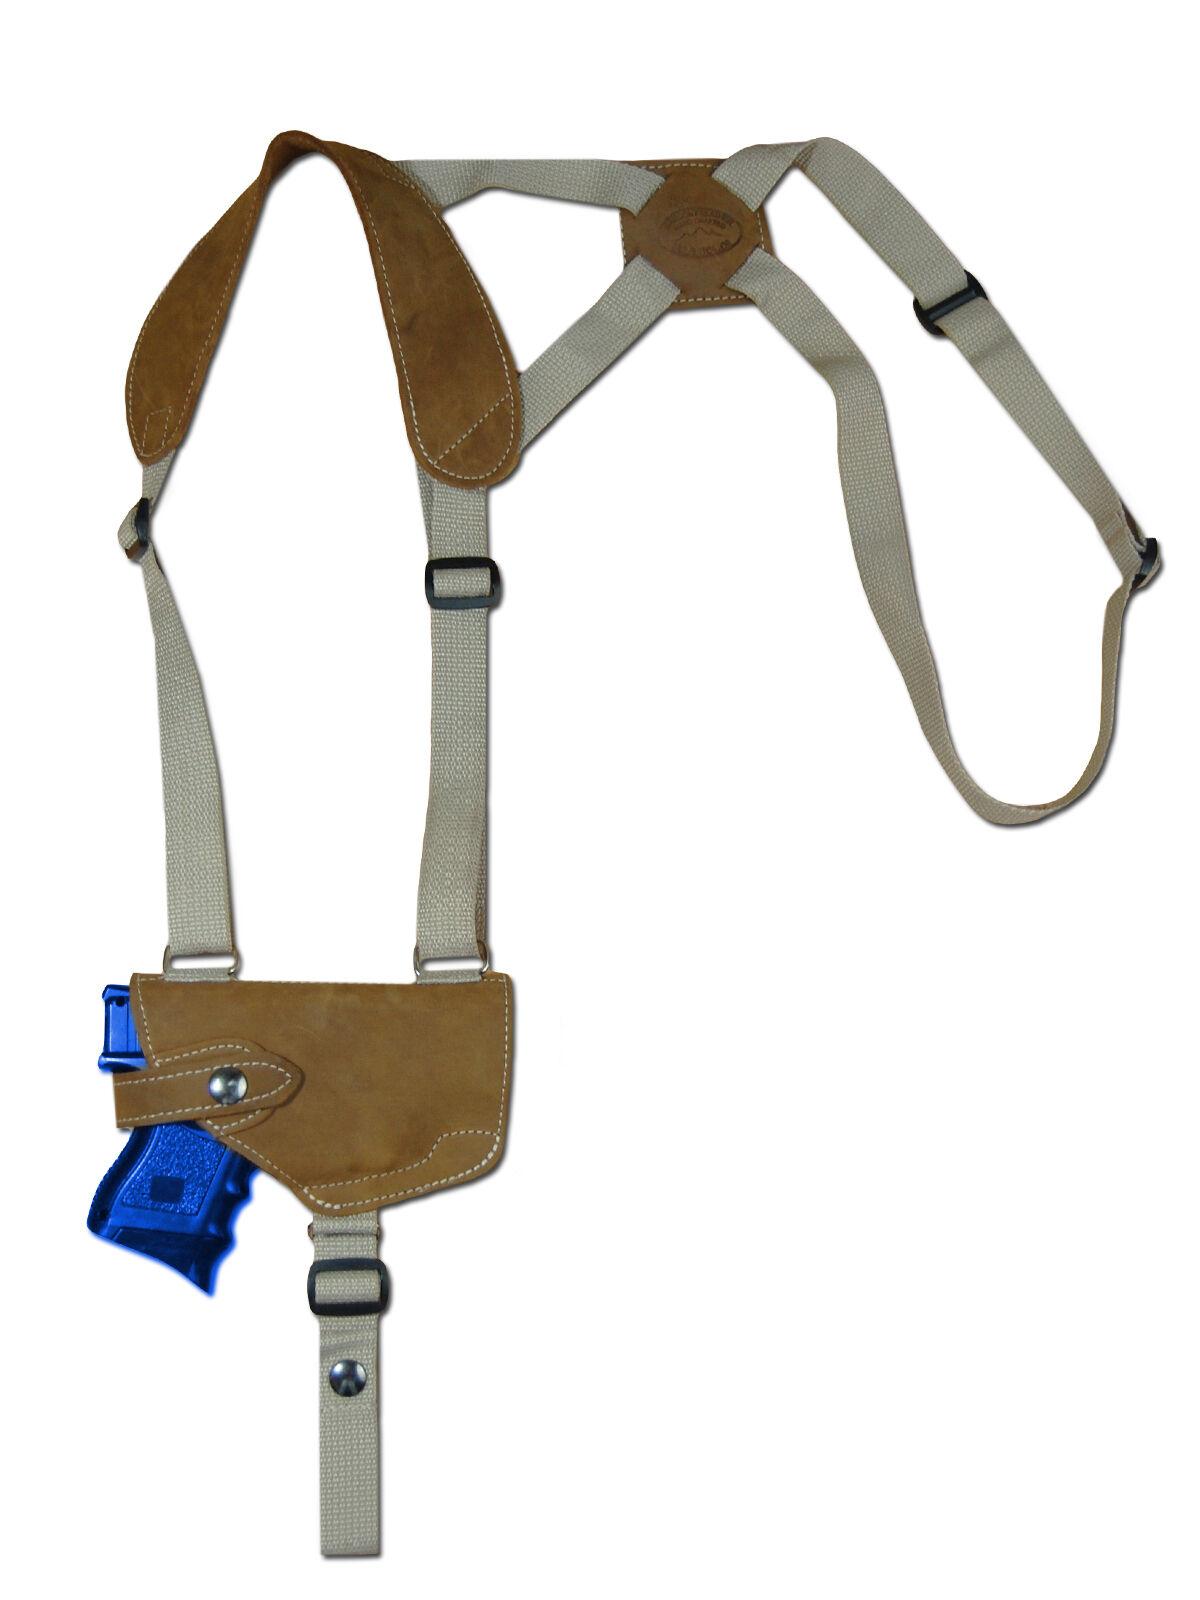 NEW Barsony Horizontal Olive Drab Leder Shoulder Holster CZ EAA Comp 9mm 40 45